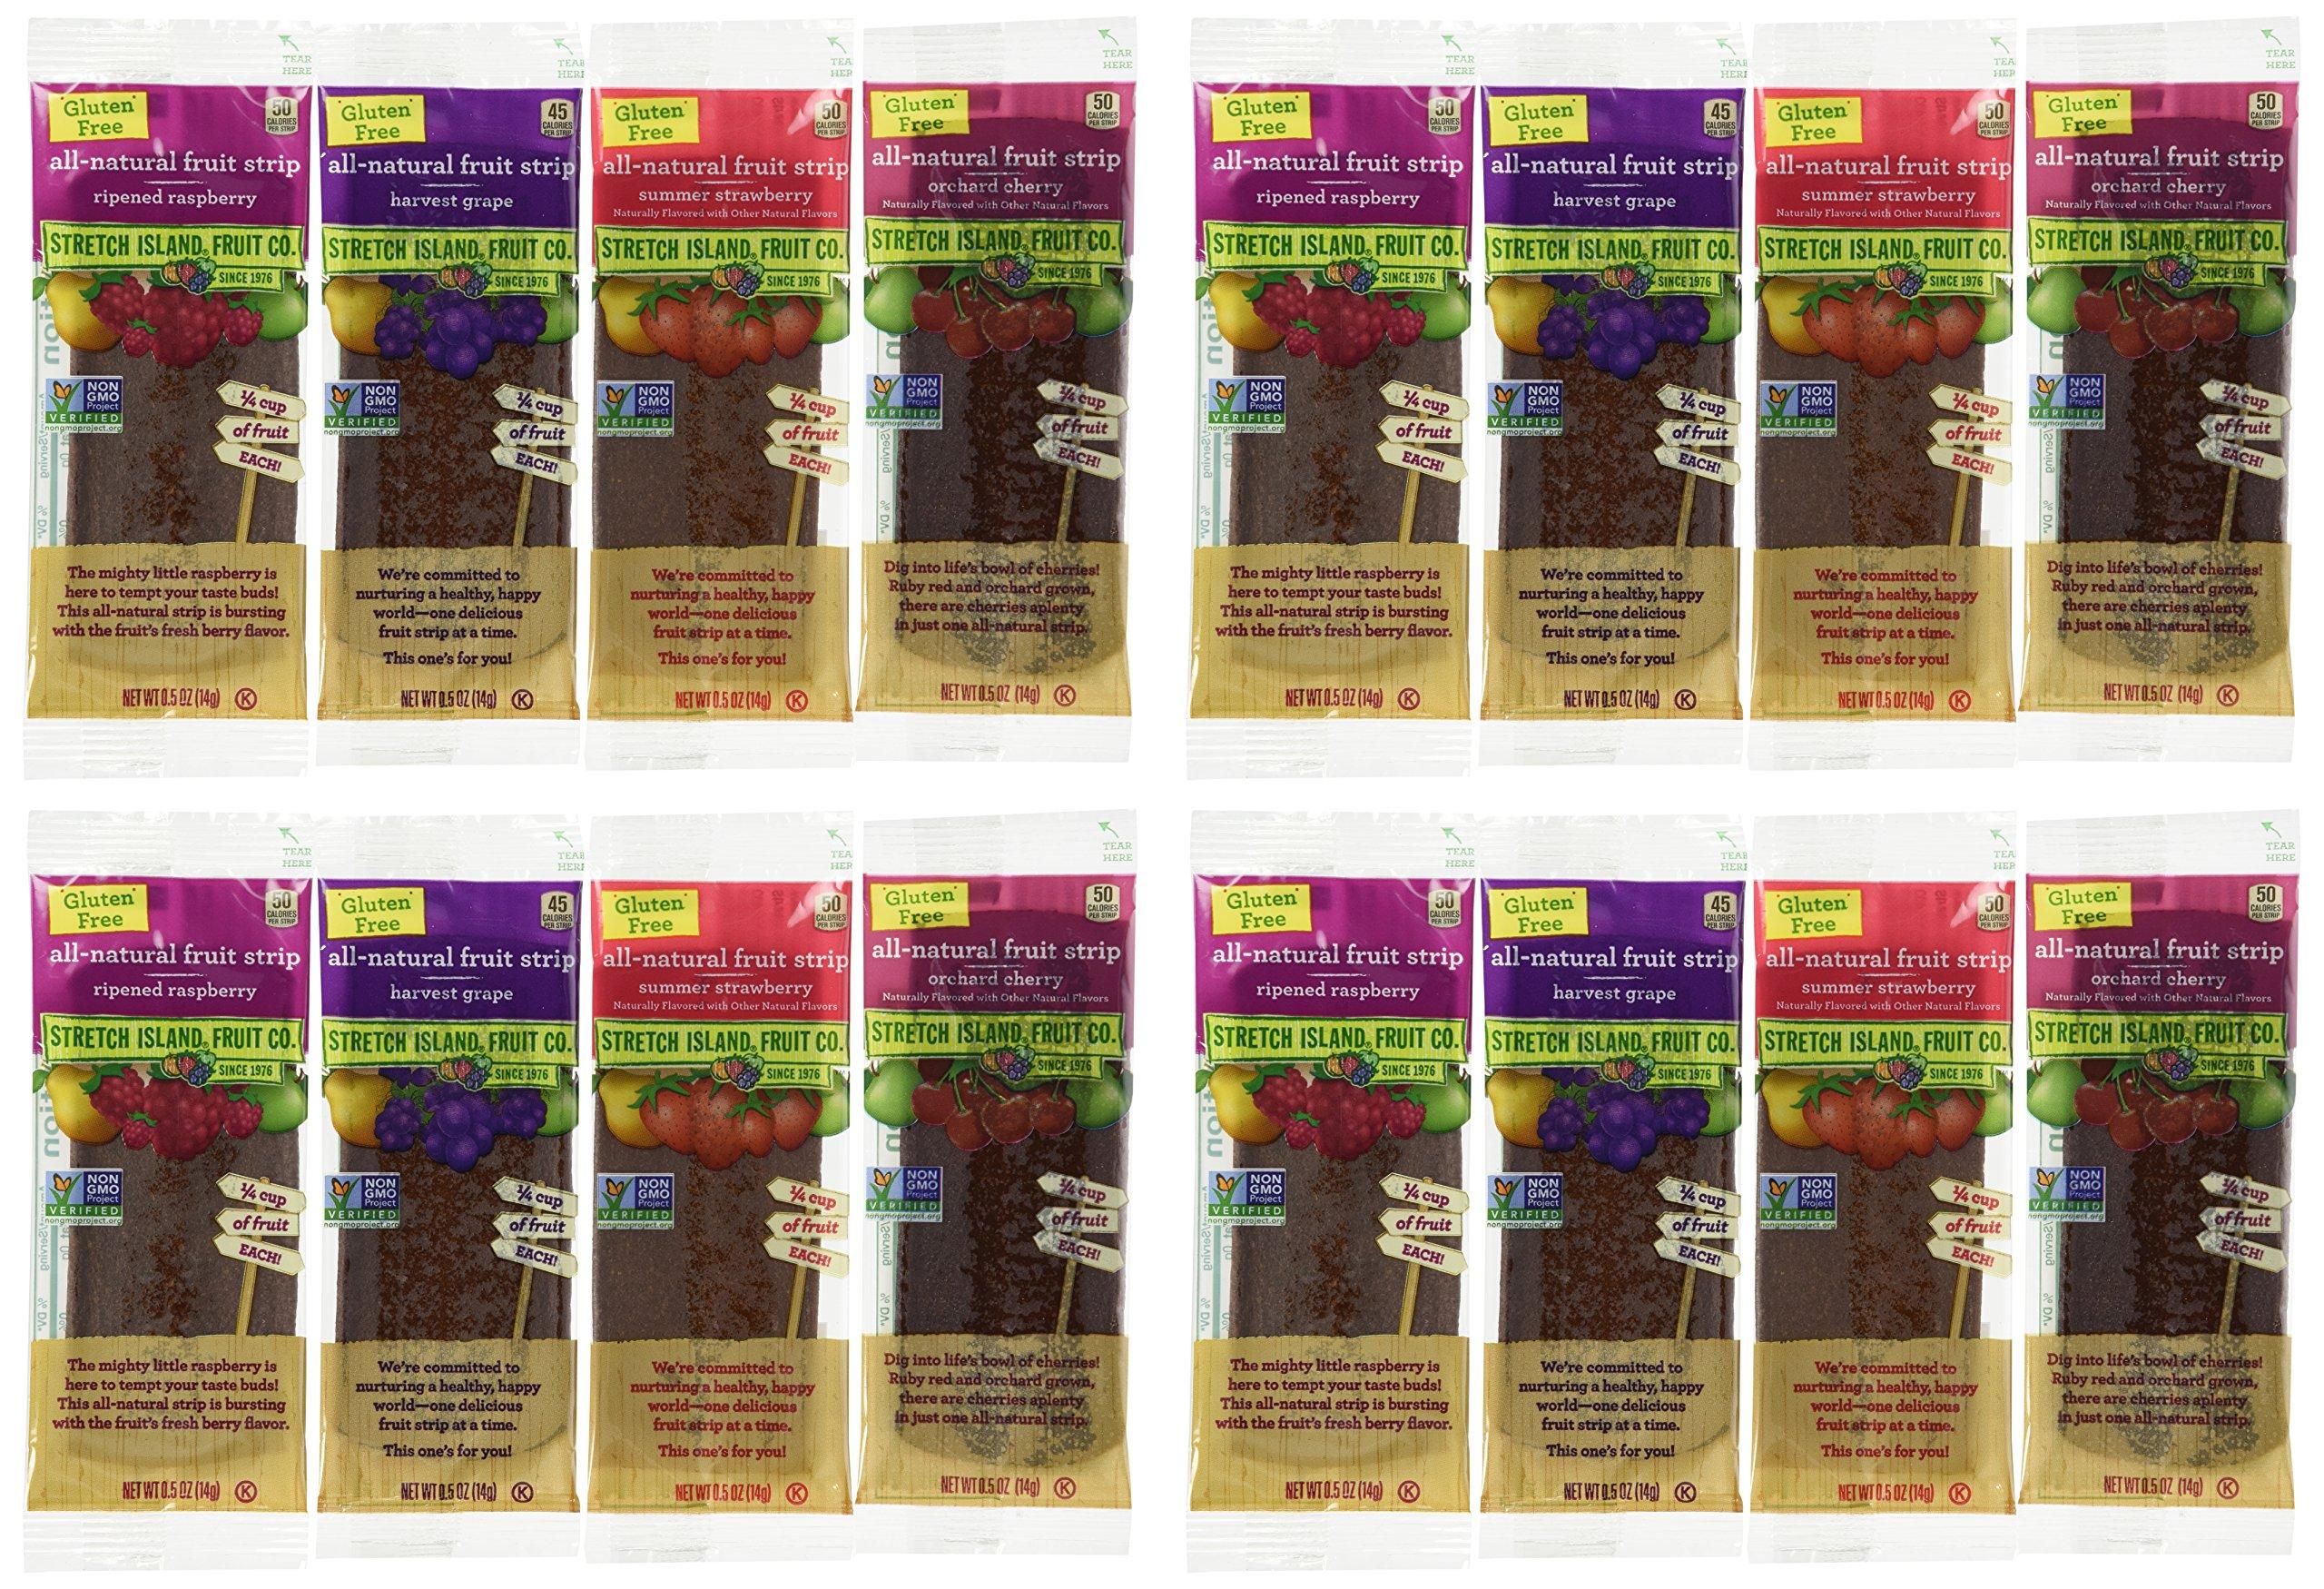 Stretch Island All-Natural Gluten Free Fruit Strips 4 Flavor 16 Snack Variety Bundle: (4) Stretch Island Ripened Raspberry, (4) Stretch Island Orchard Cherry, (4) Stretch Island Summer Strawberry, and (4) Stretch Island Harvest Grape, .5 Oz. Ea. (16 Snack